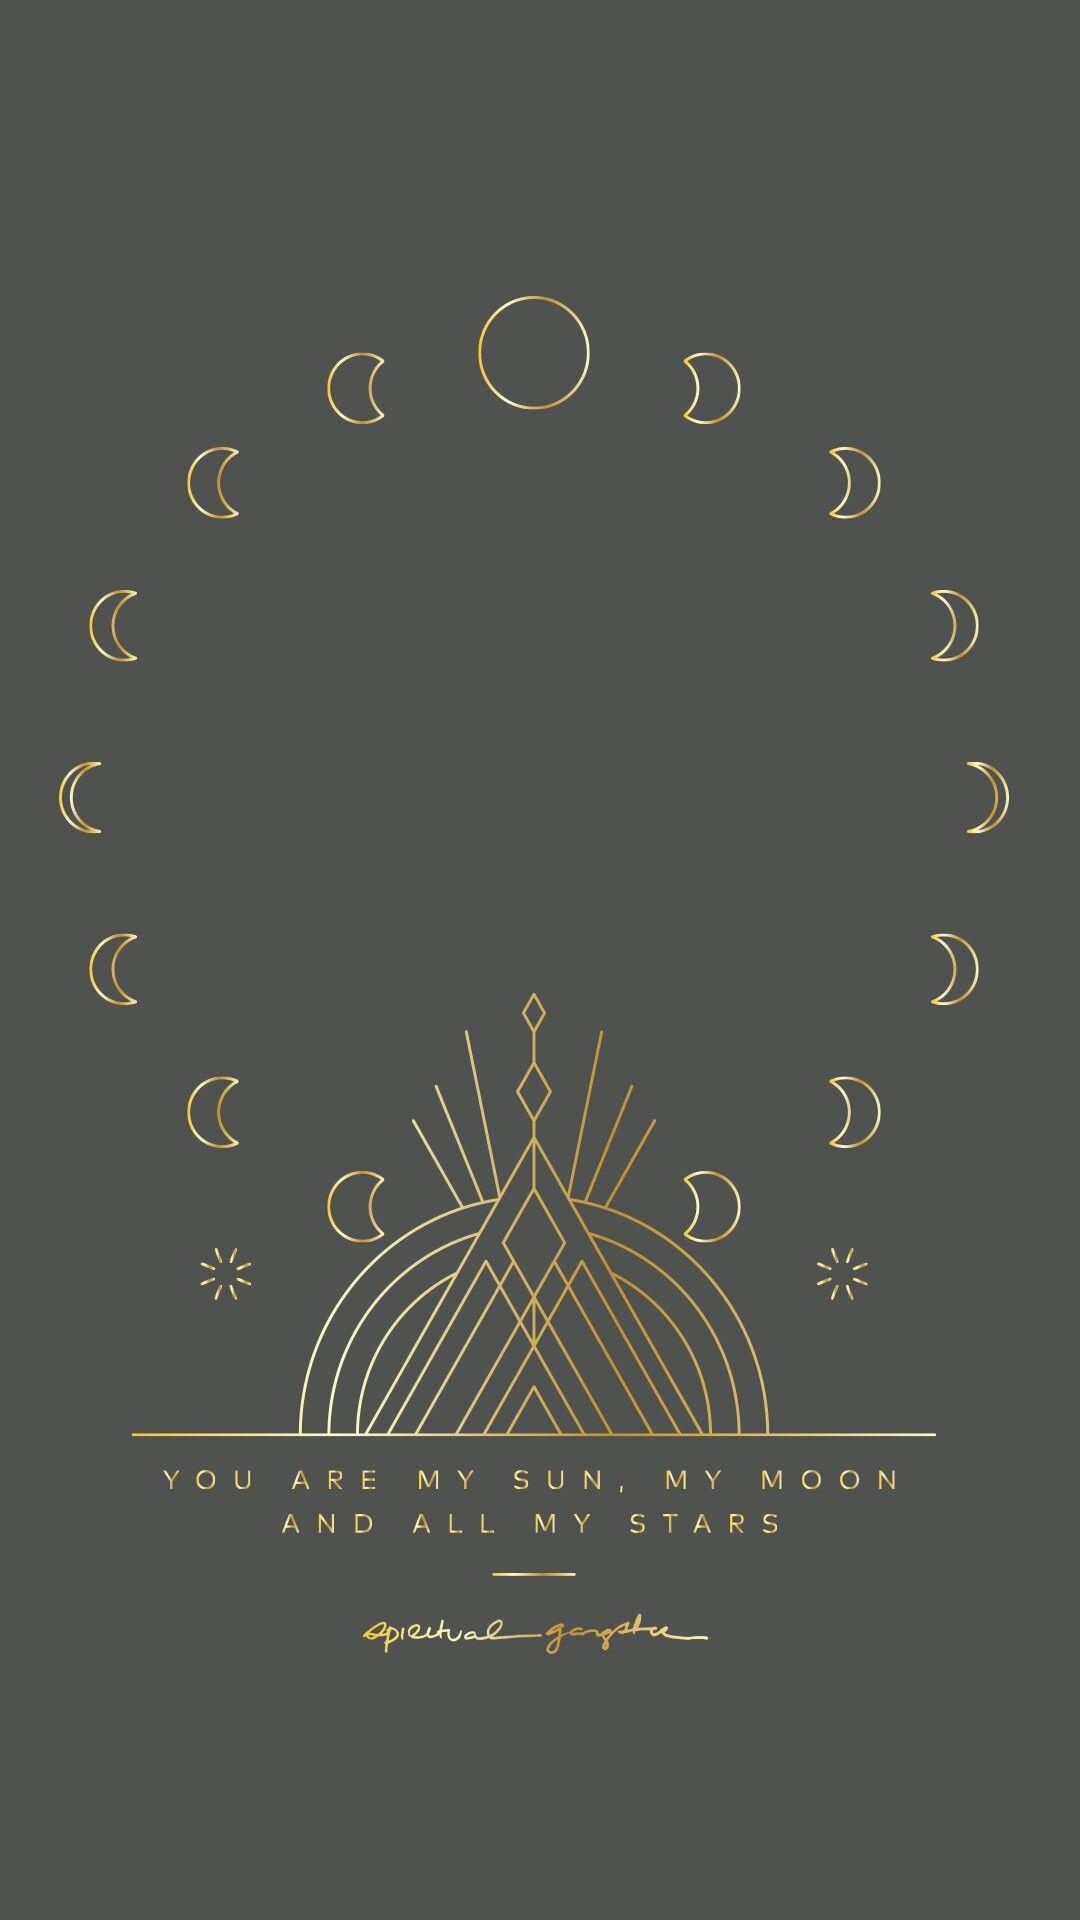 Pin By S T E P H S S T U D I O On Wallpaper Witchy Wallpaper Spiritual Wallpaper Hippie Wallpaper